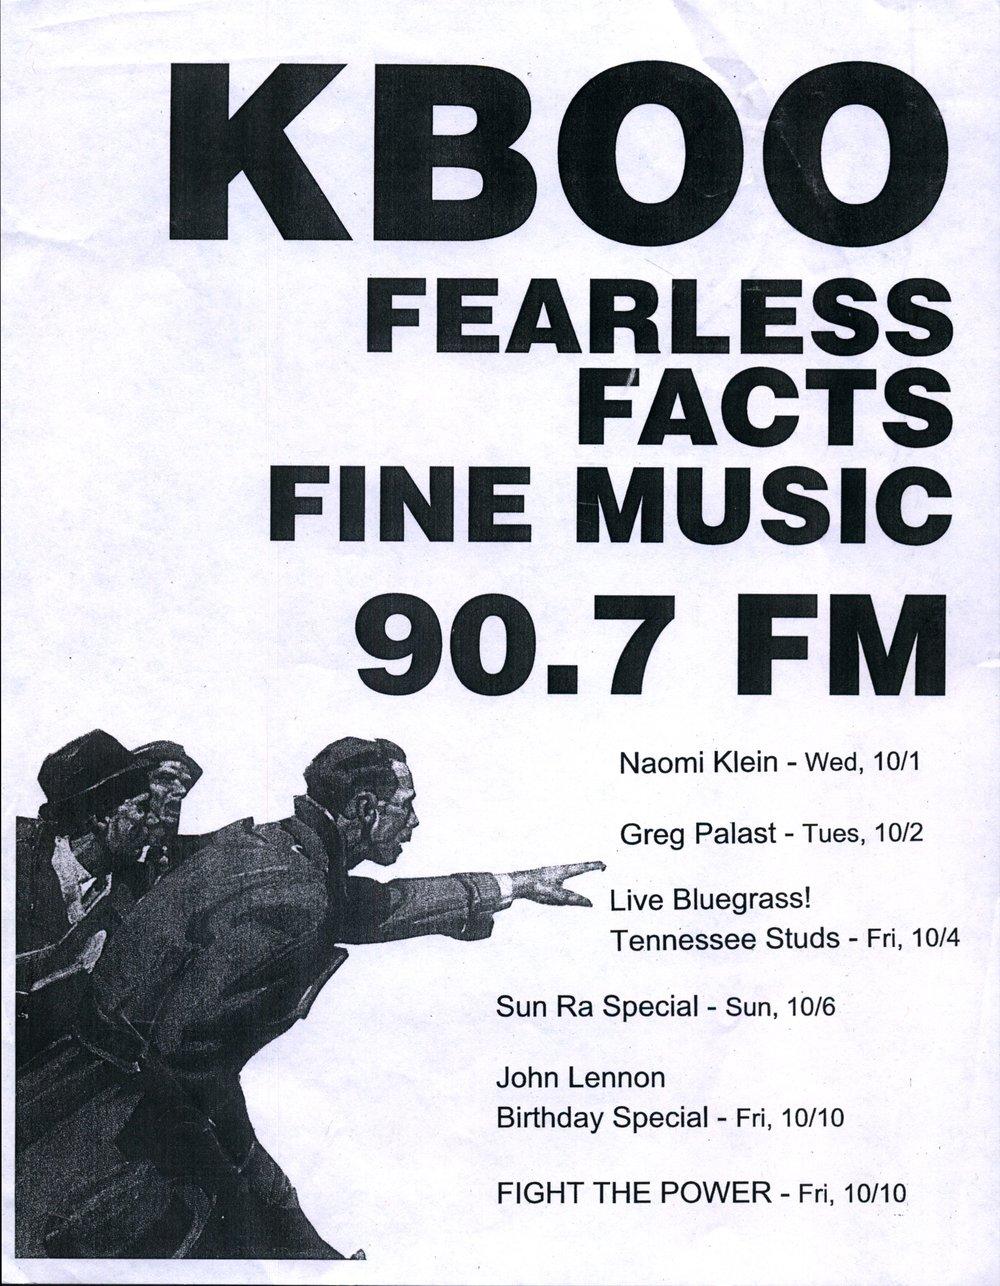 KBOO_flyers_032.jpg